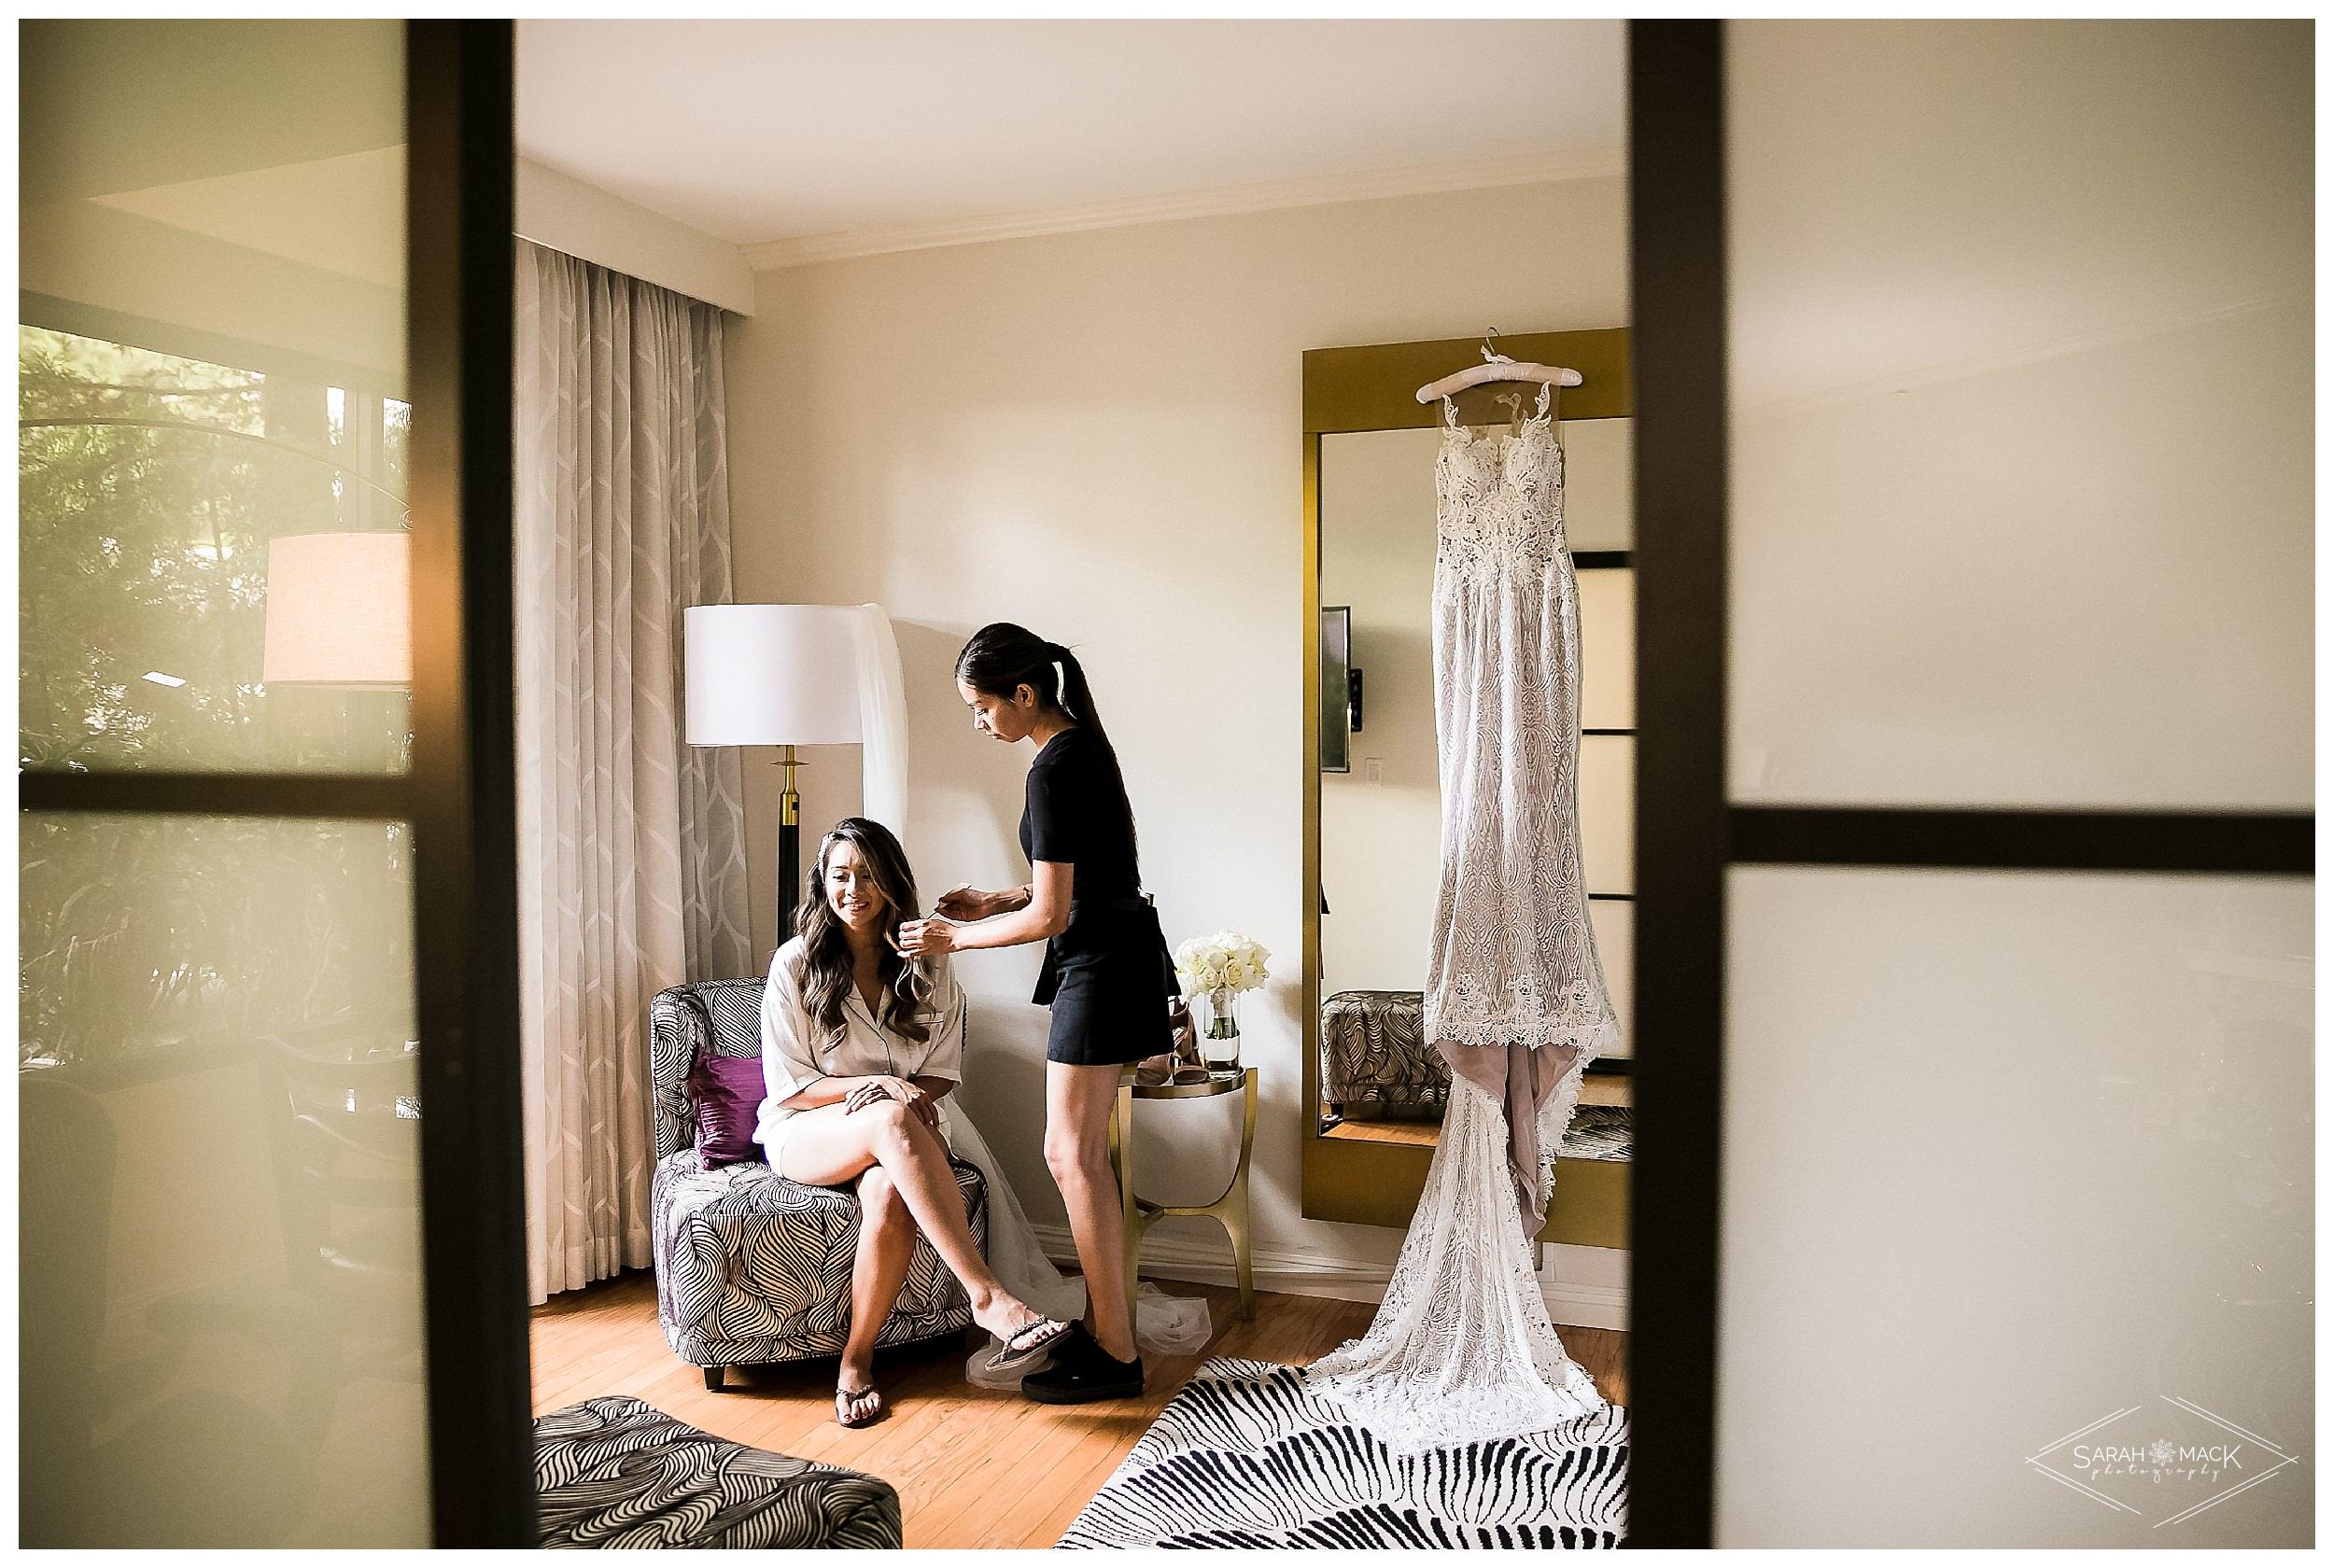 LE-Avenue-of-the-Arts-Costa-Mesa-Wedding-Photography-0005.jpg